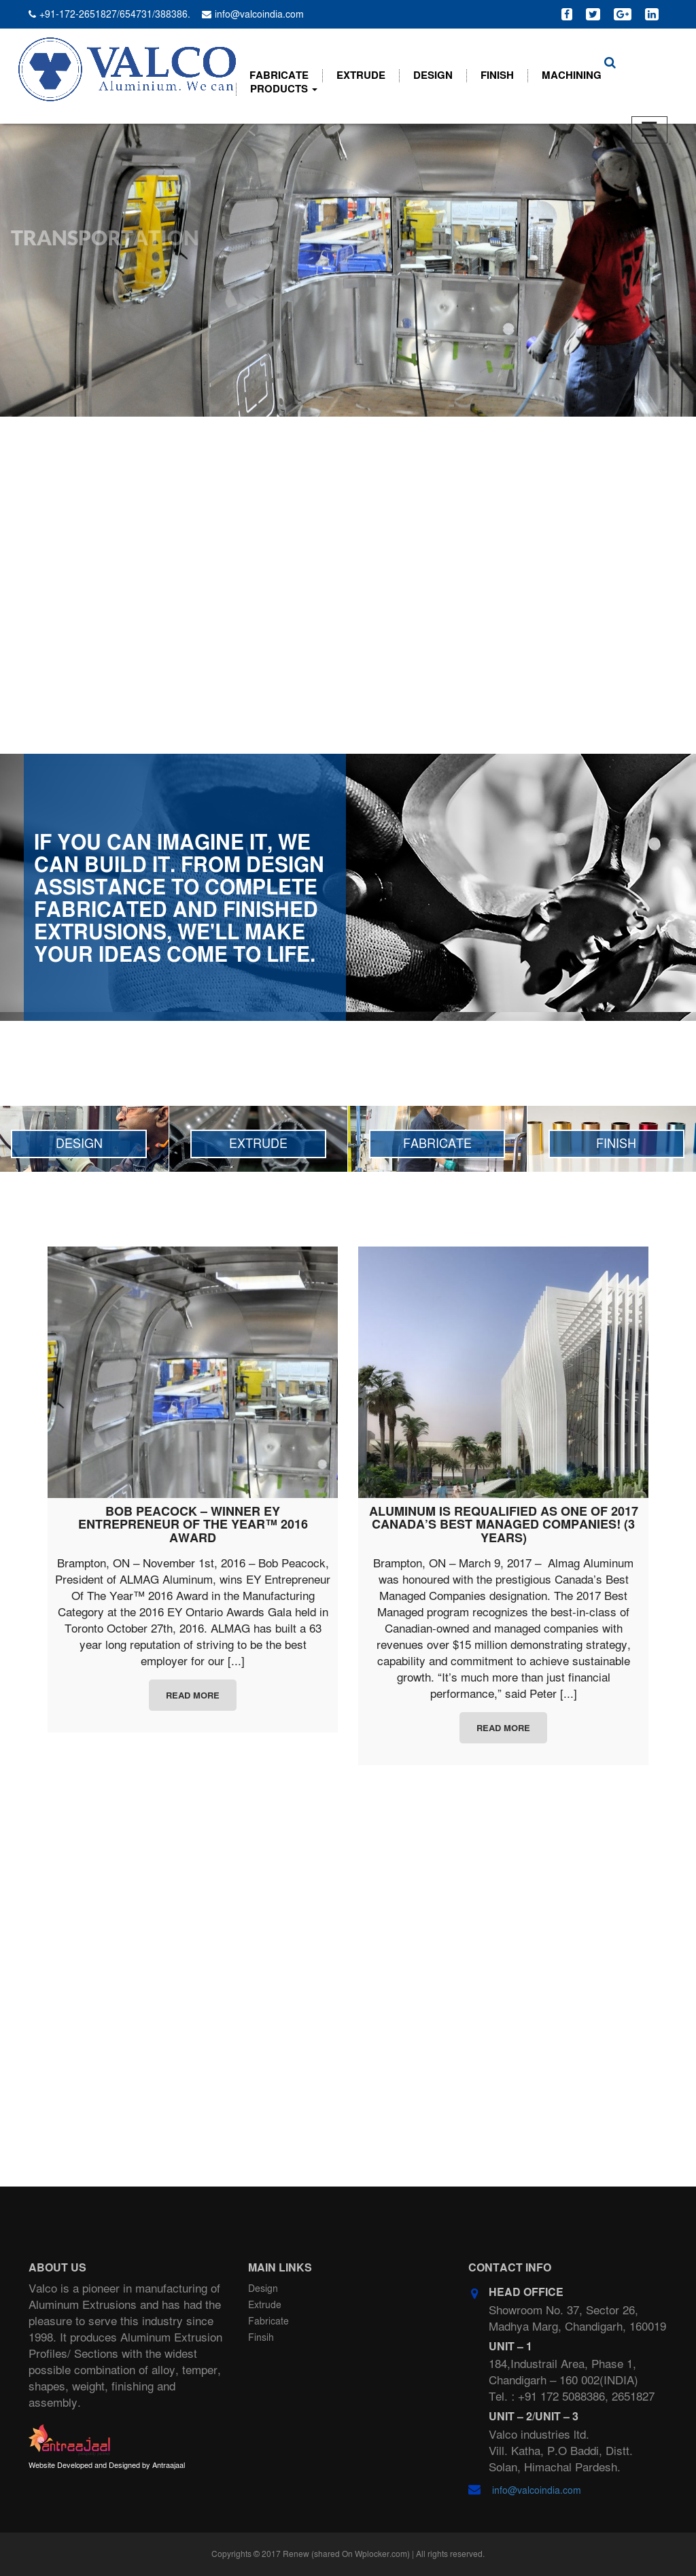 Valco Aluminum Extrusions Competitors, Revenue and Employees